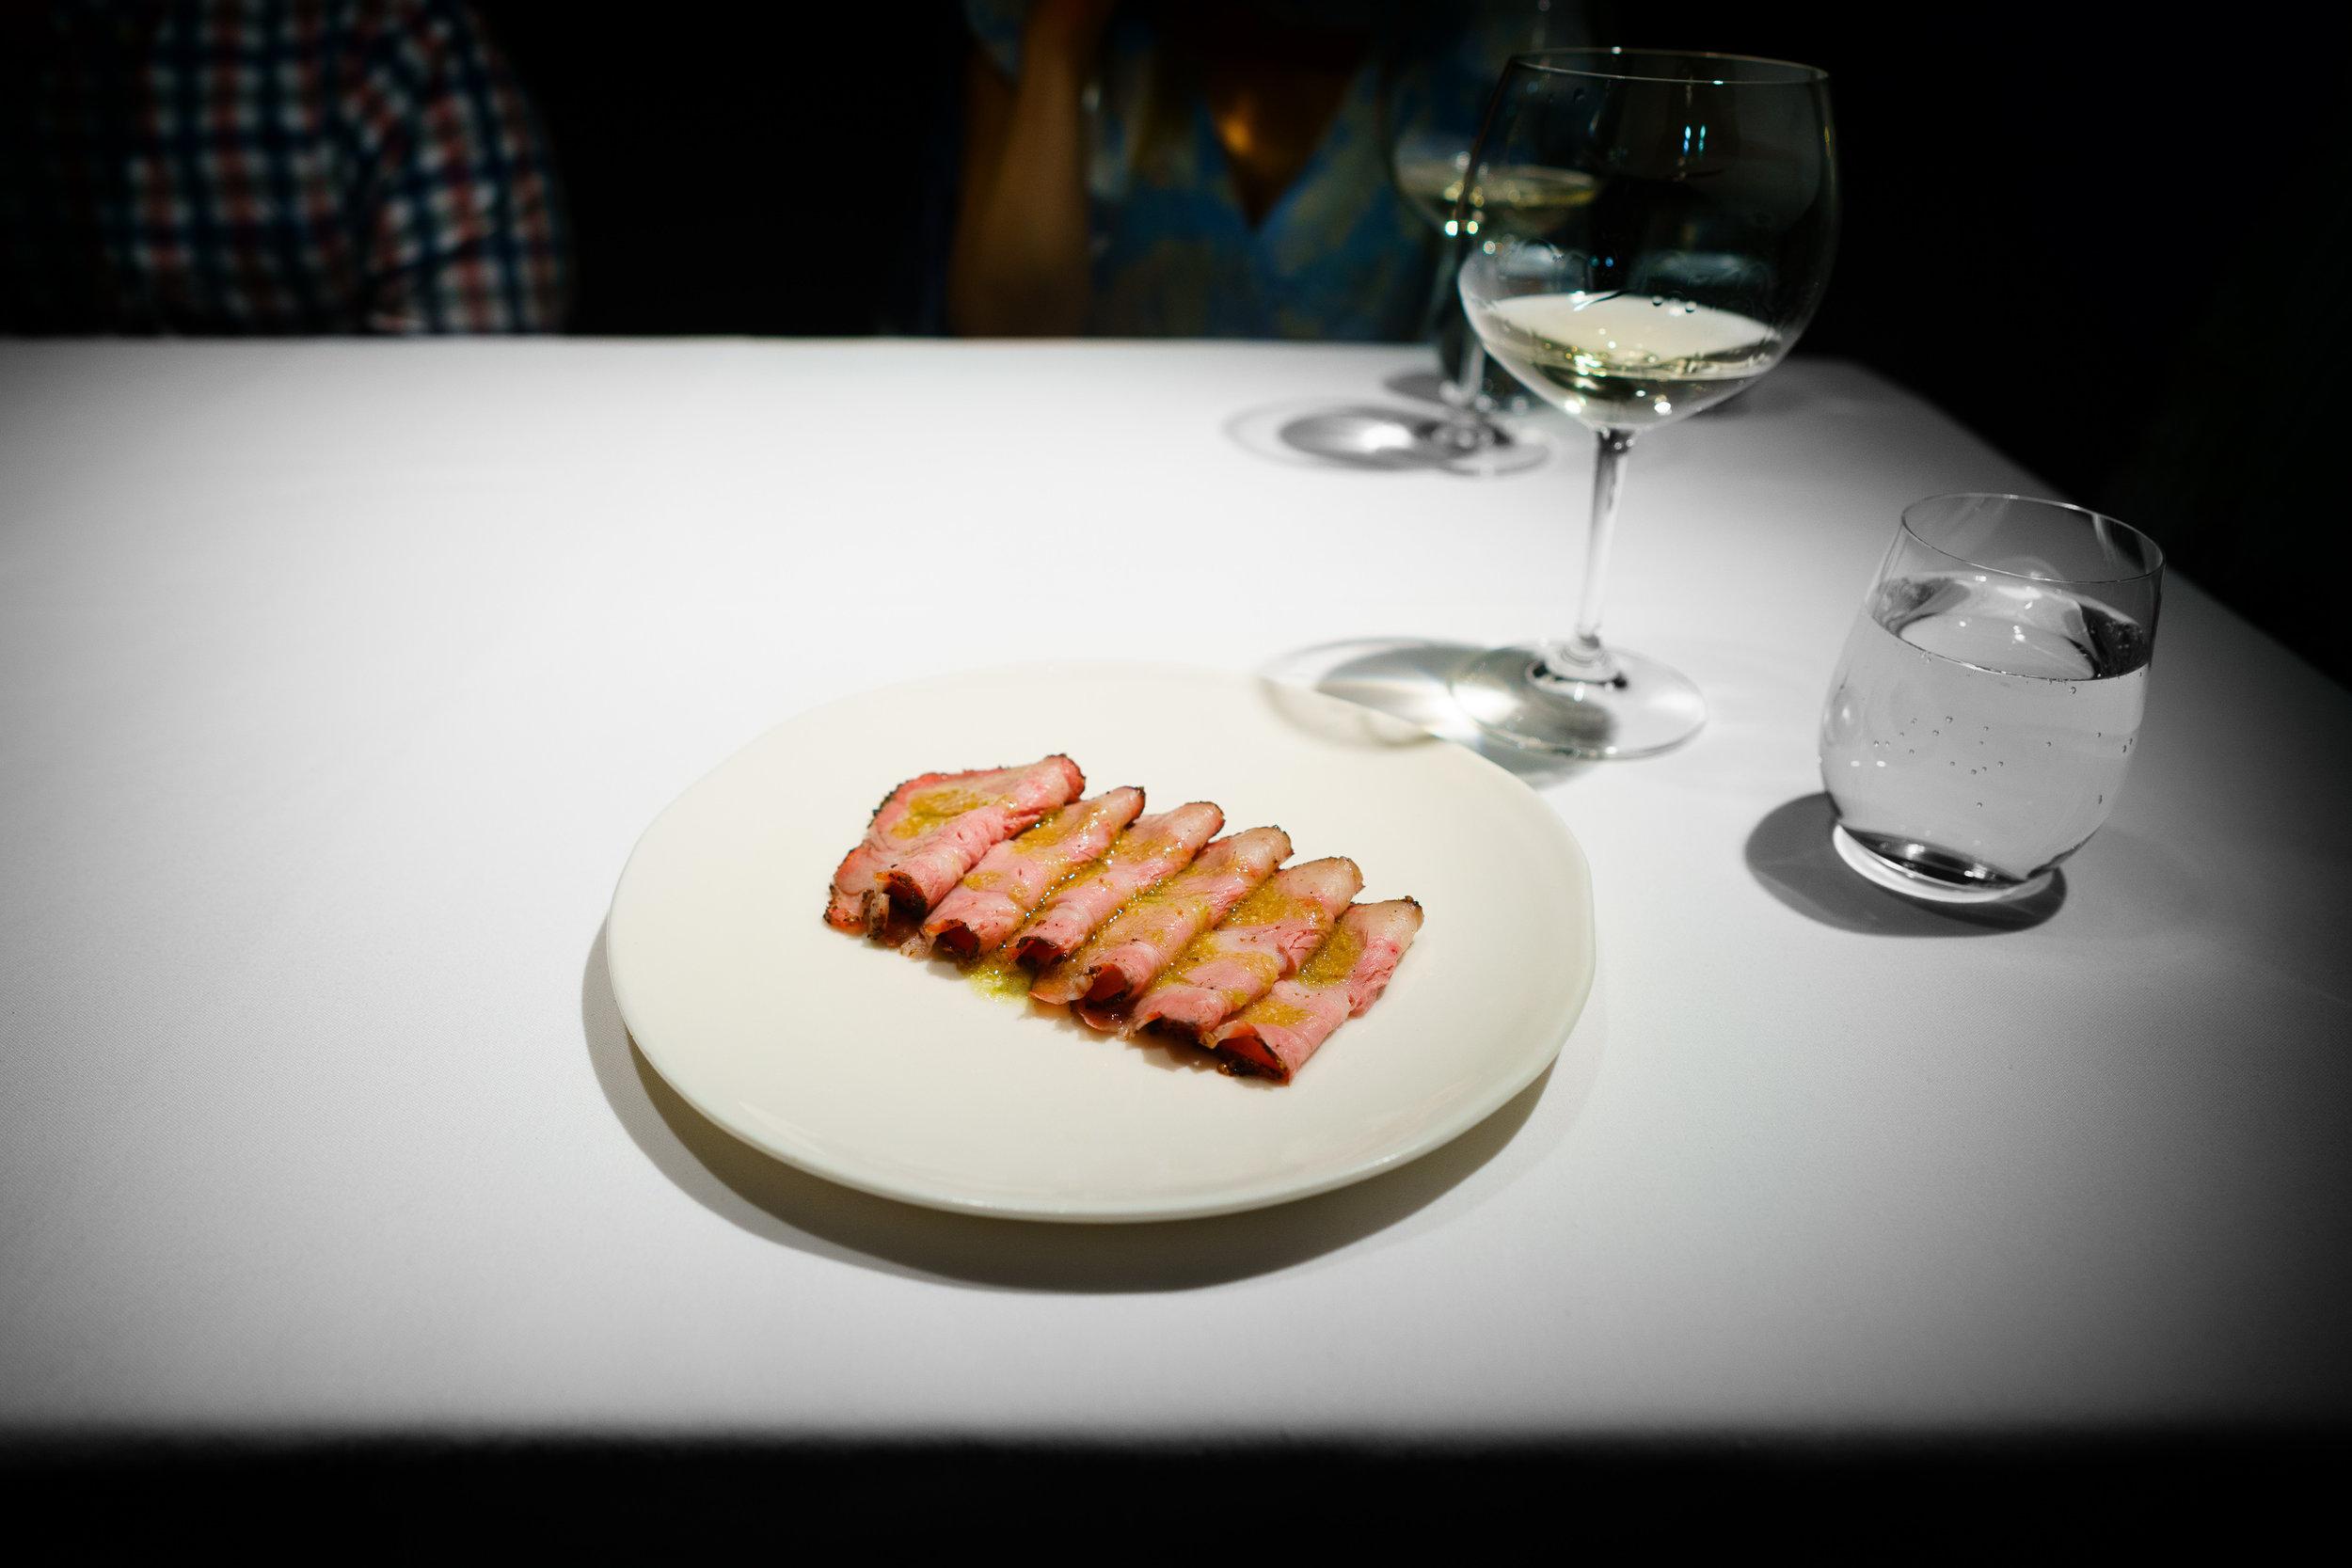 6th Course: Smoked Pork